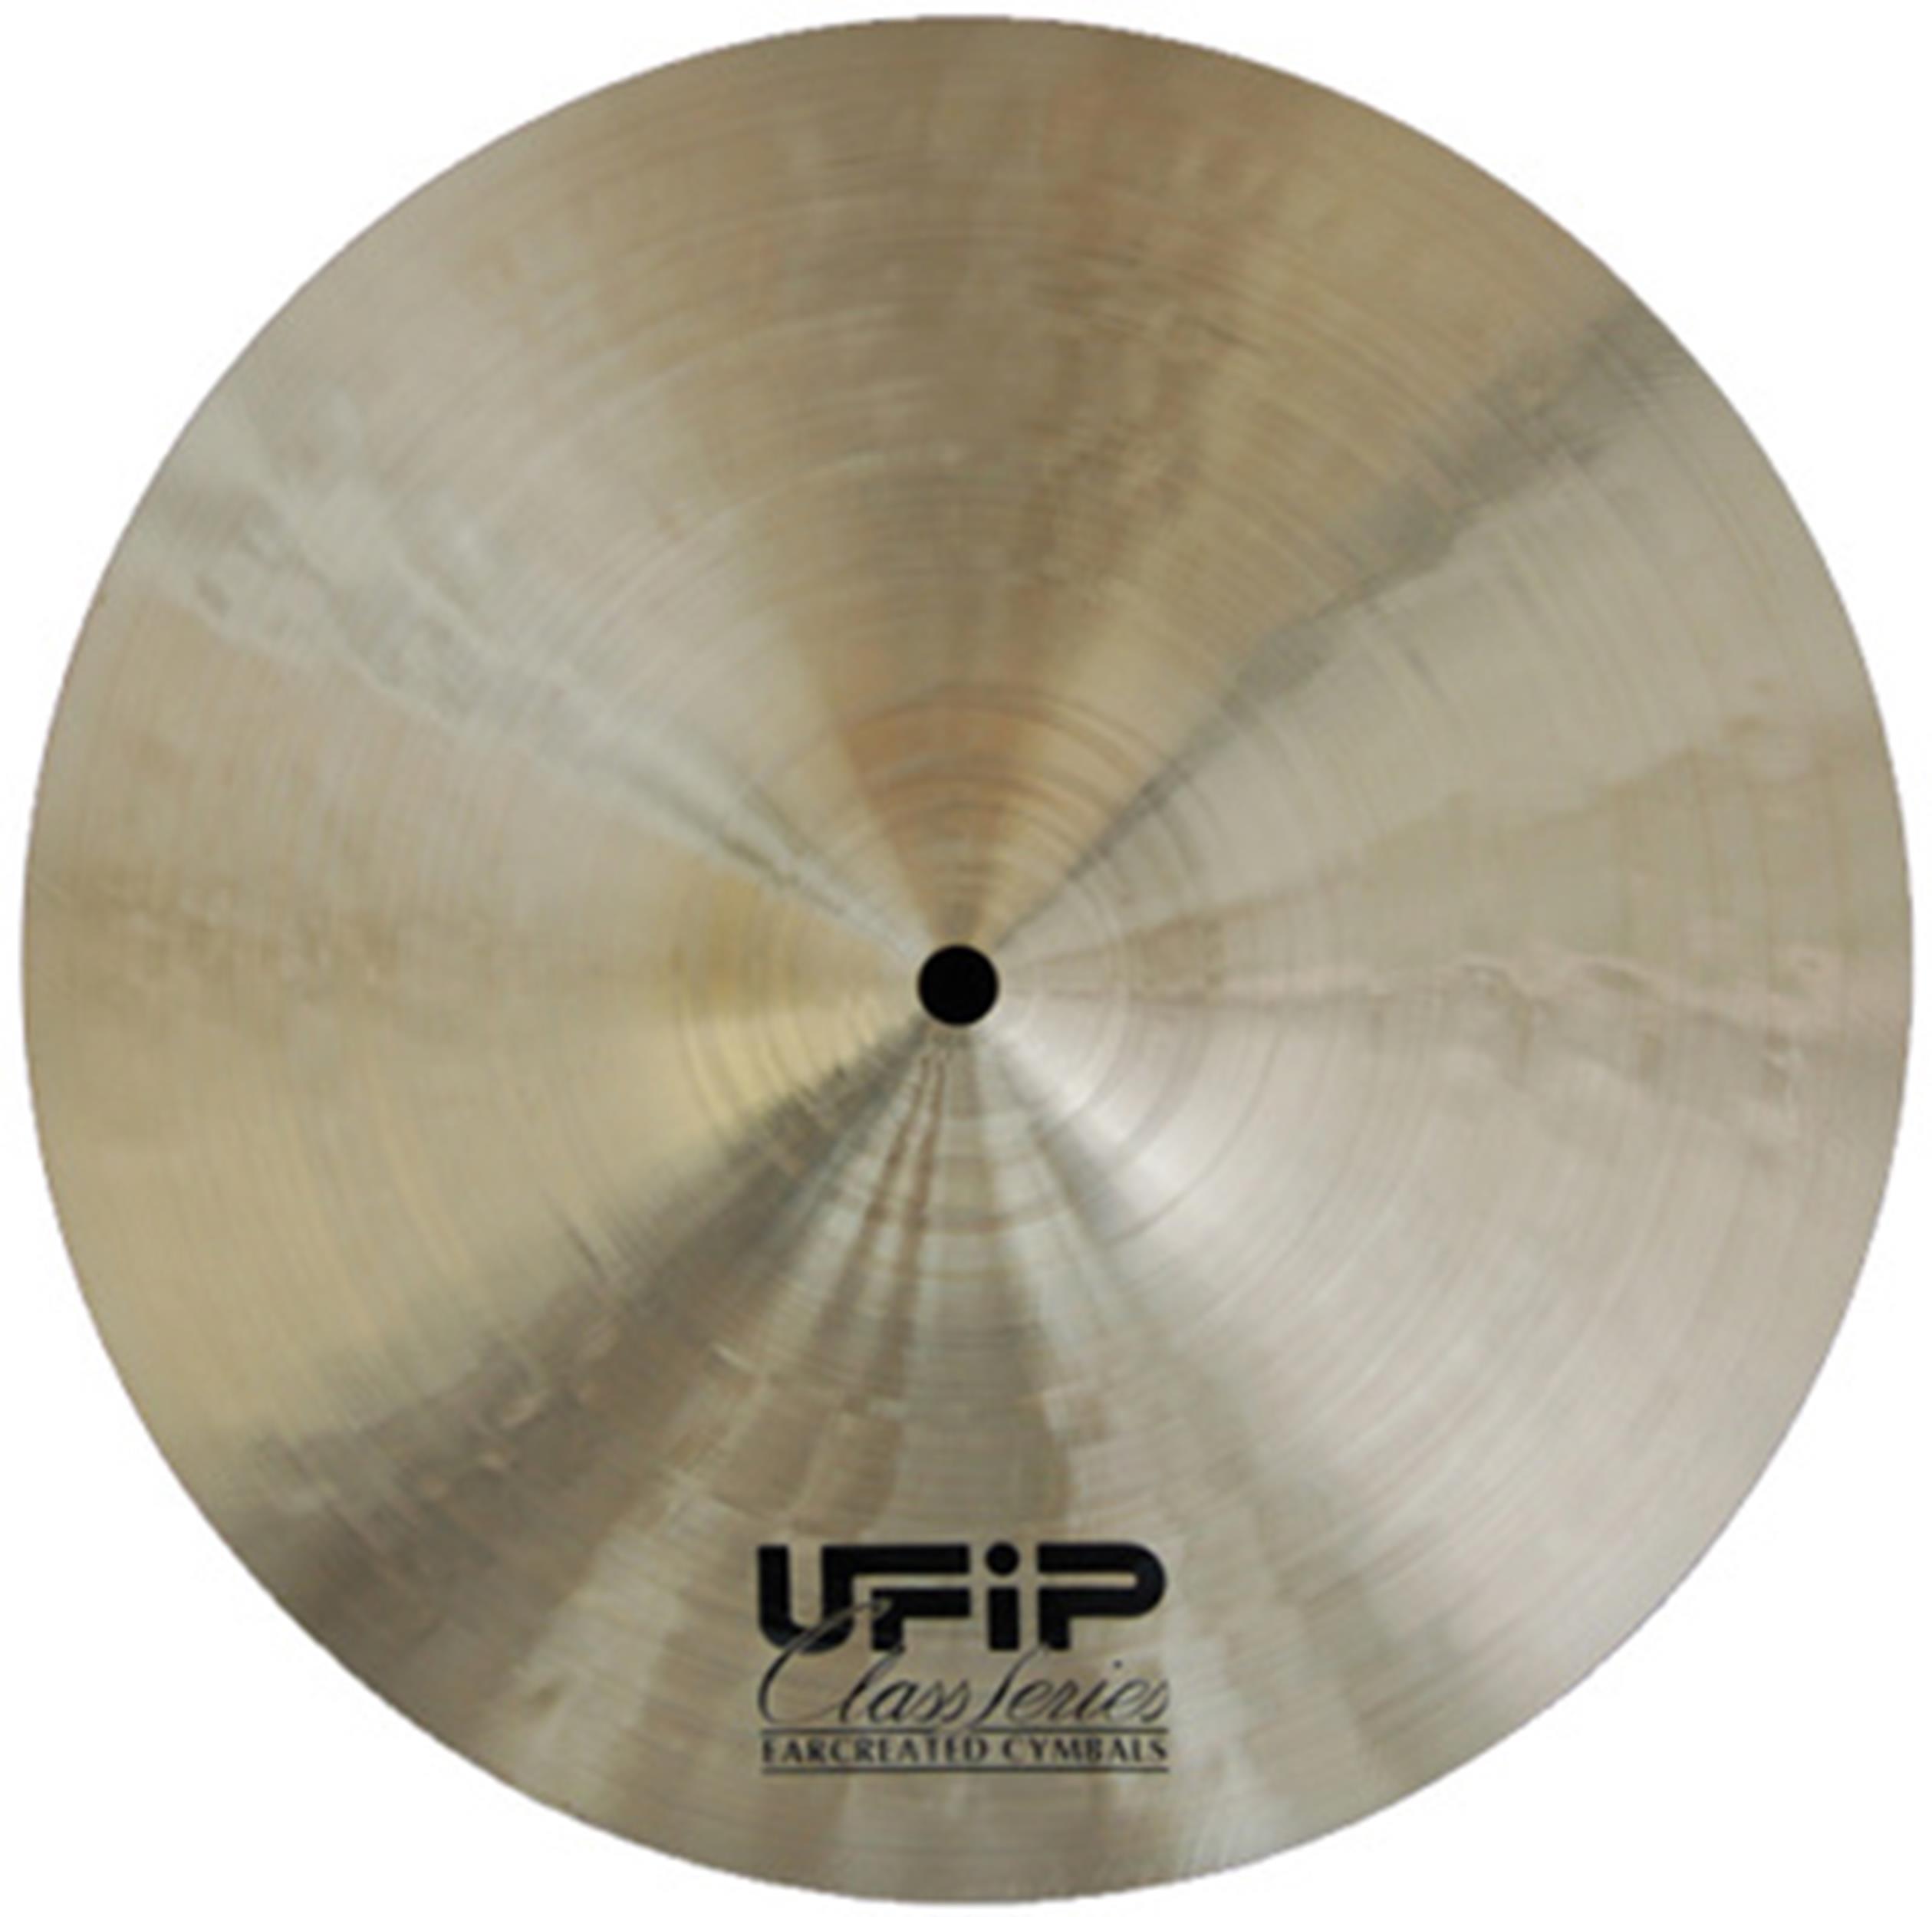 UFIP CLASS SPLASH 12 - Batterie / Percussioni Piatti - Splash